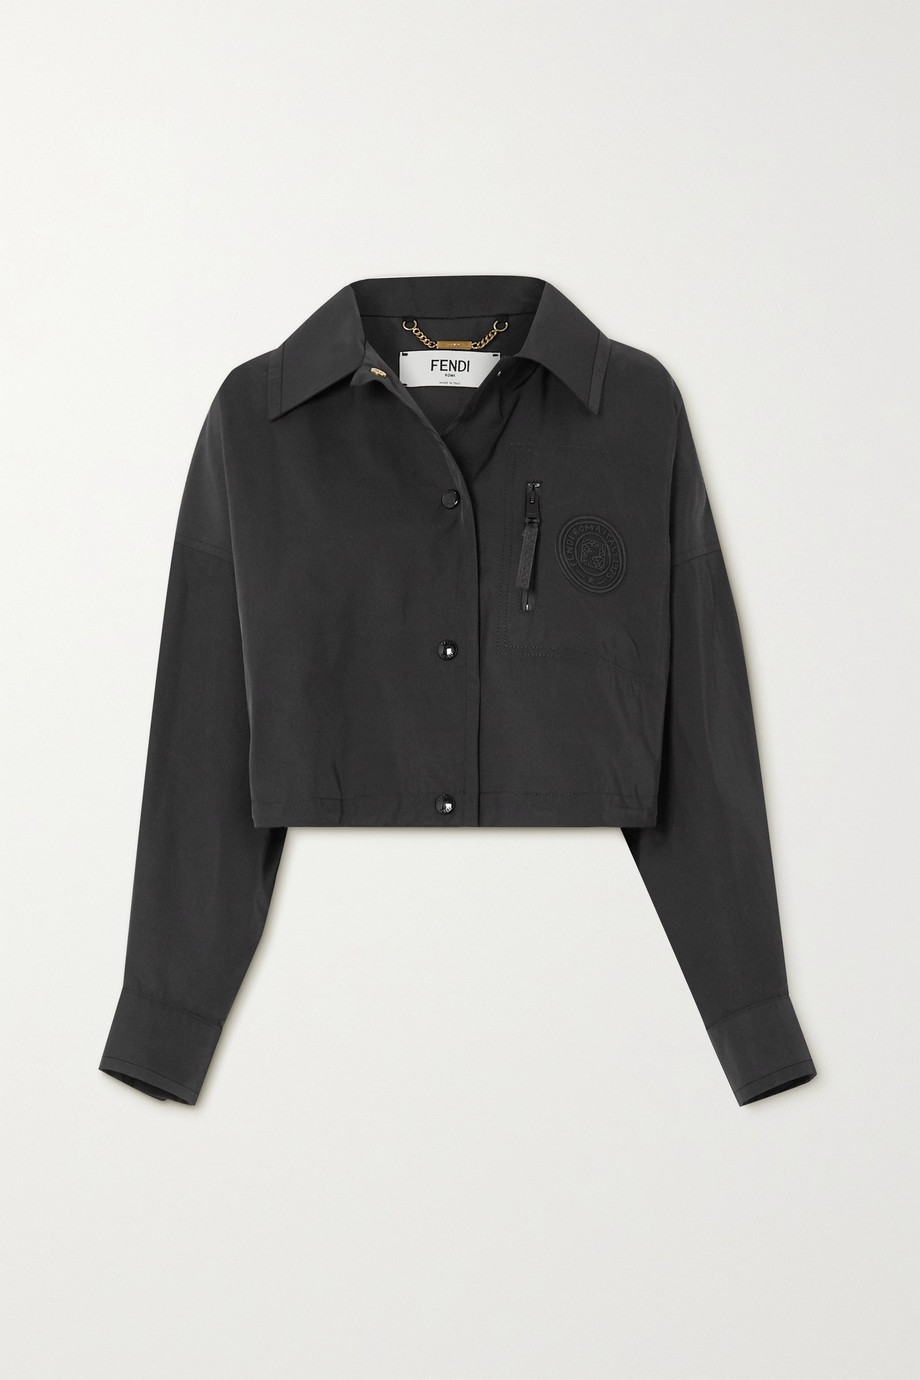 Fendi 斜纹布短款外套